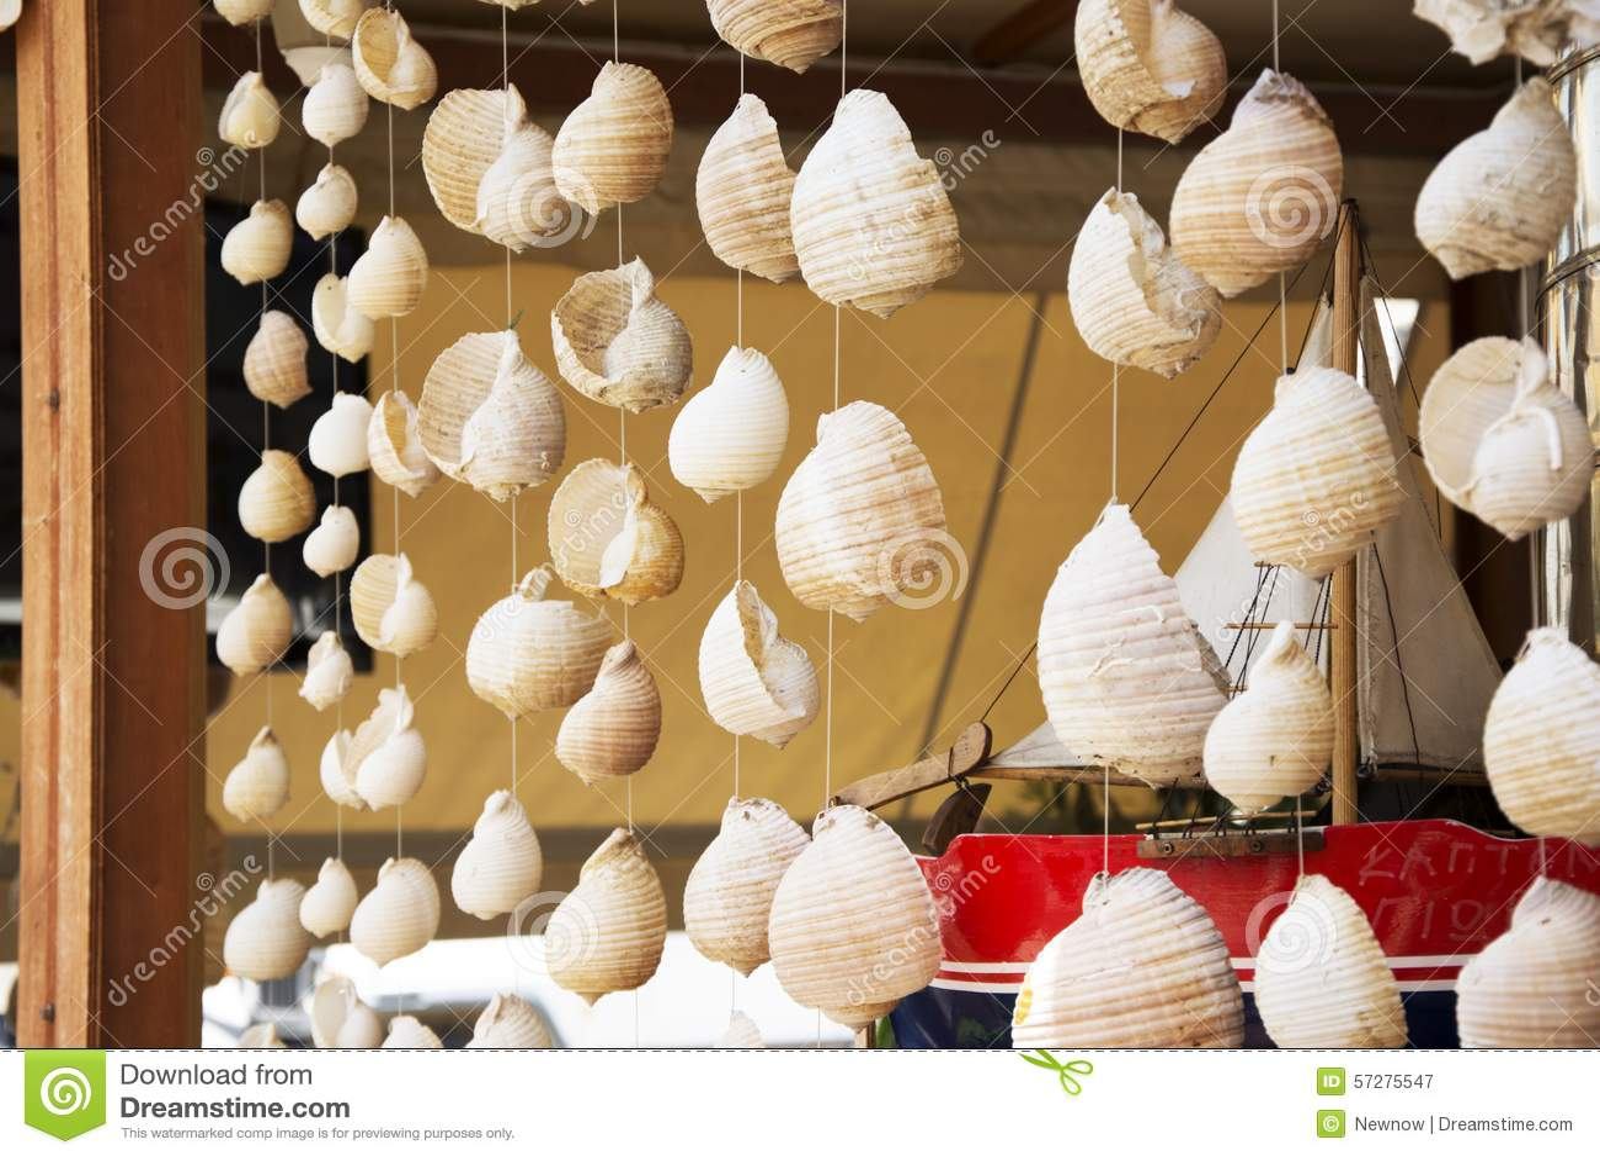 Sea Shells Hanging As Decor Stock Image Image 57275547